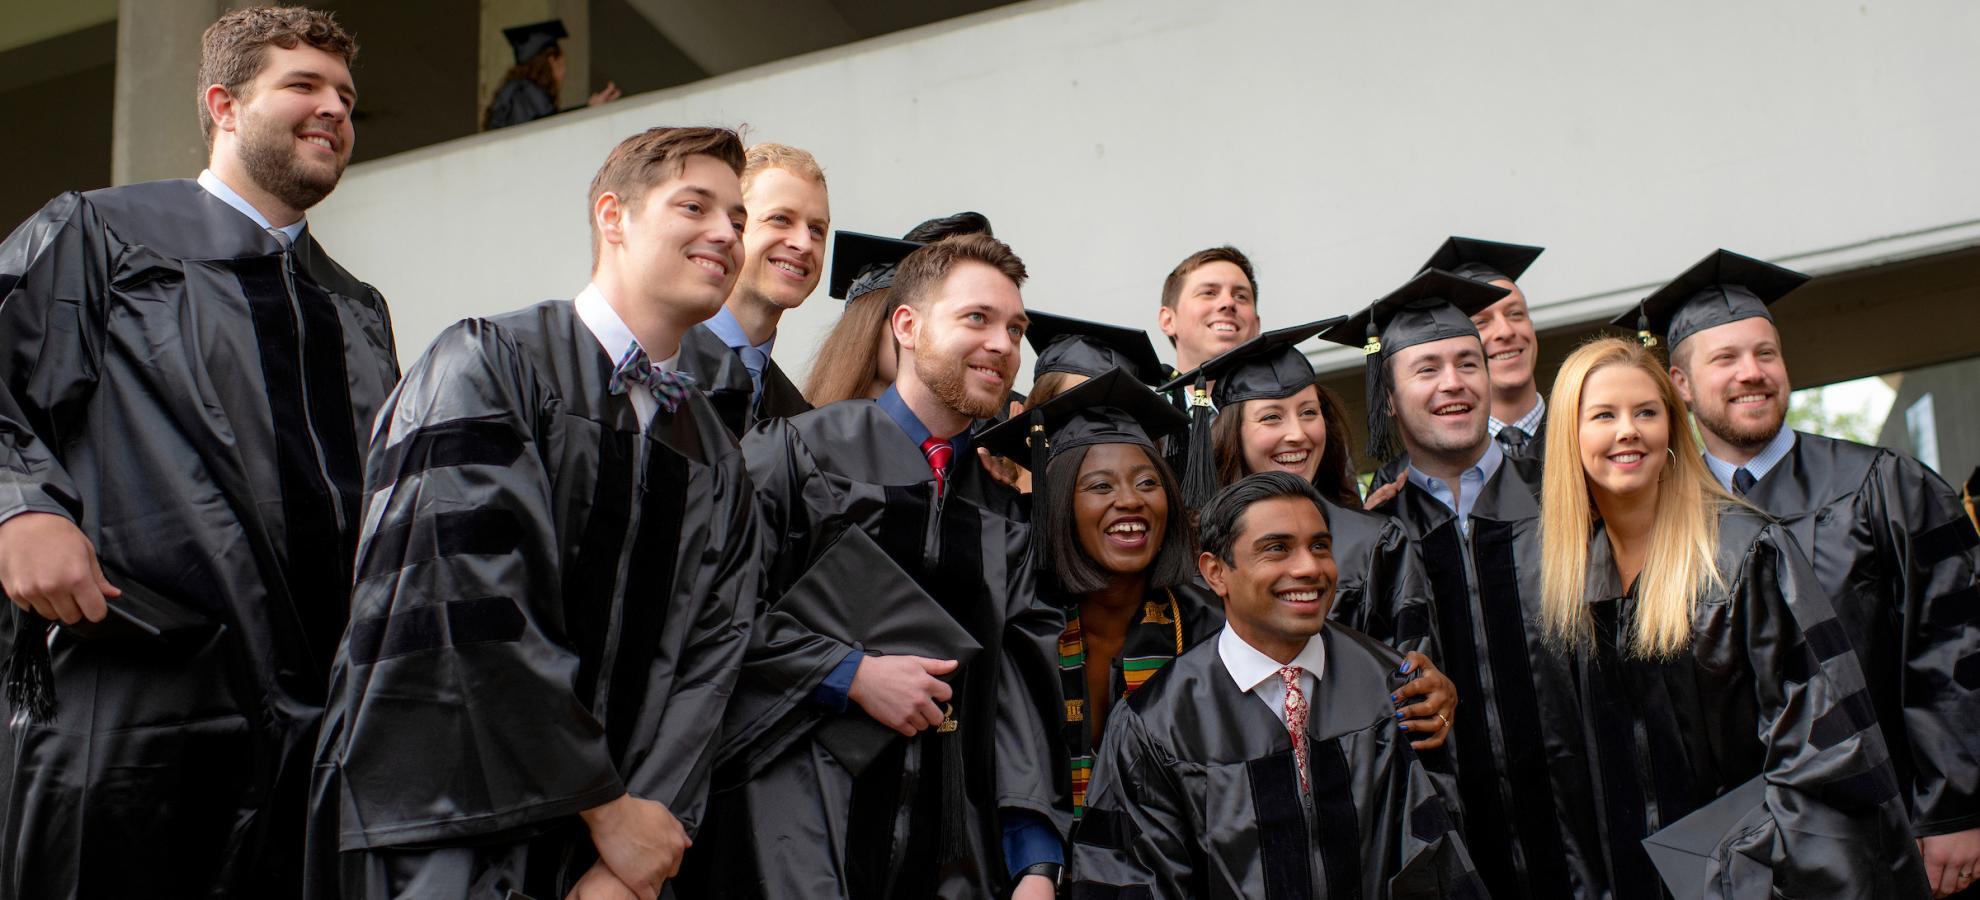 Ohio University Graduation 2020.Heritage College News Center Ohio University